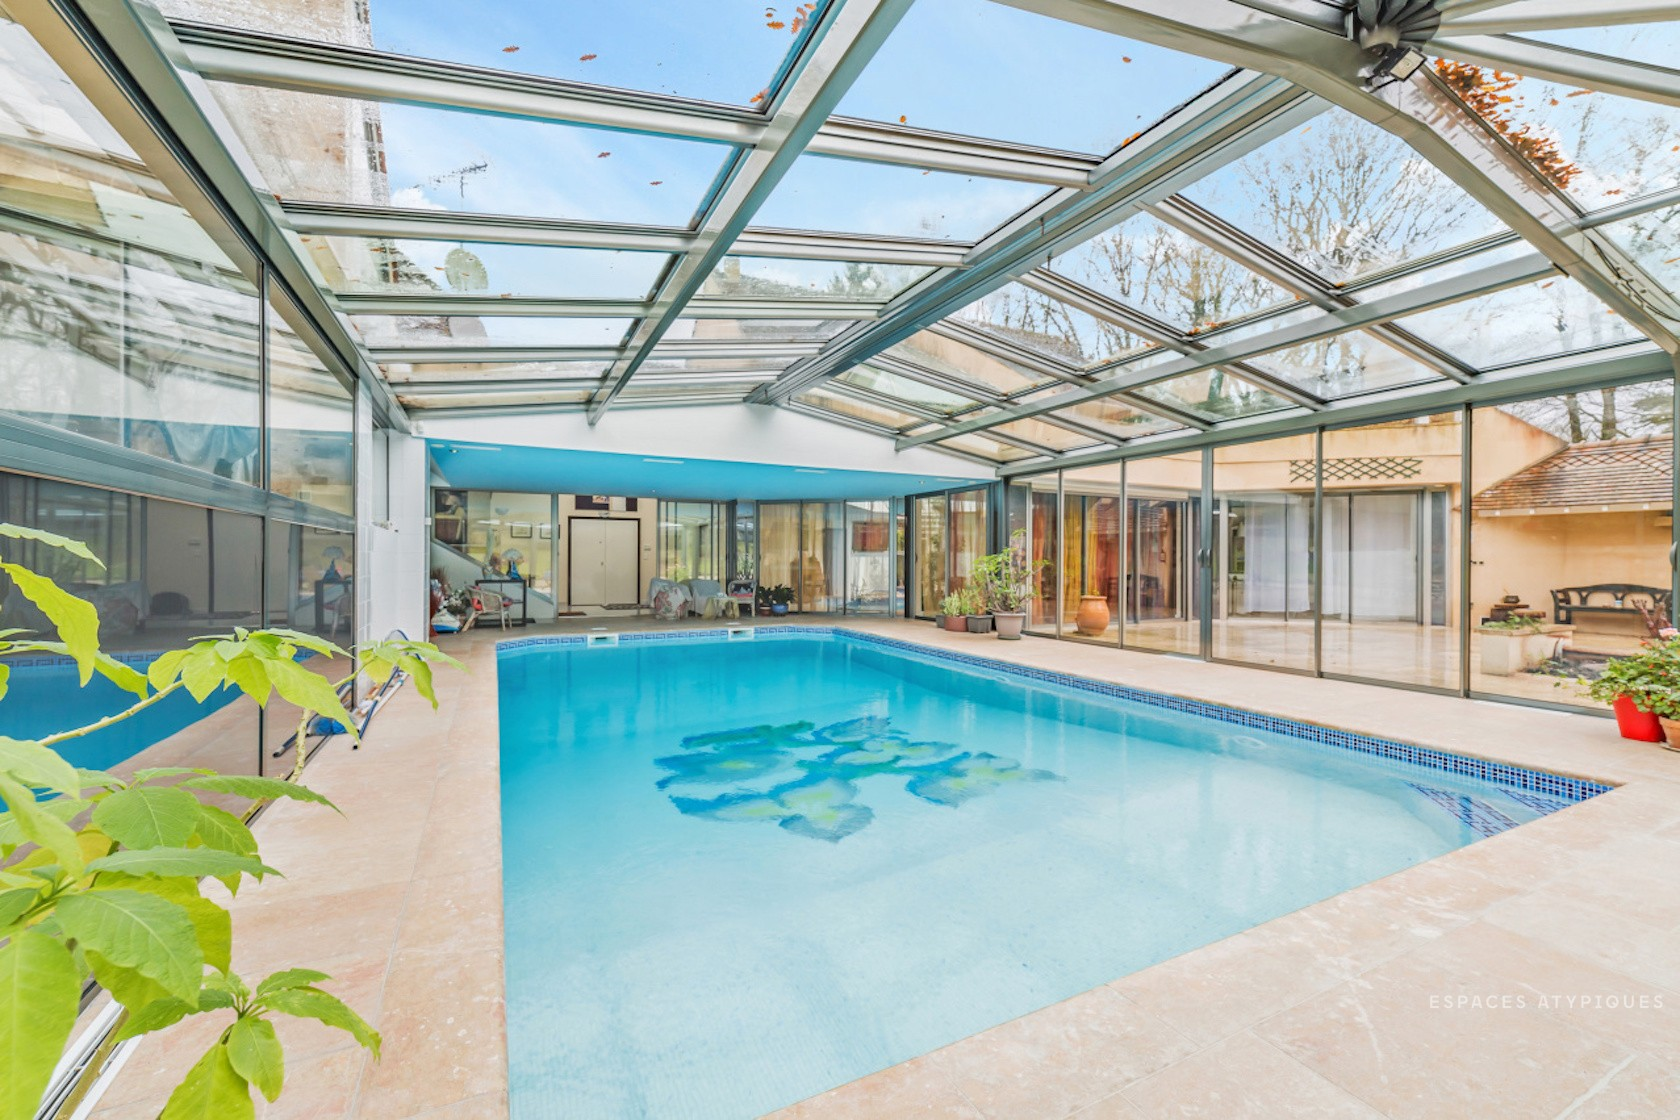 Accessoire piscine seine et marne - Hotel avec piscine seine et marne ...